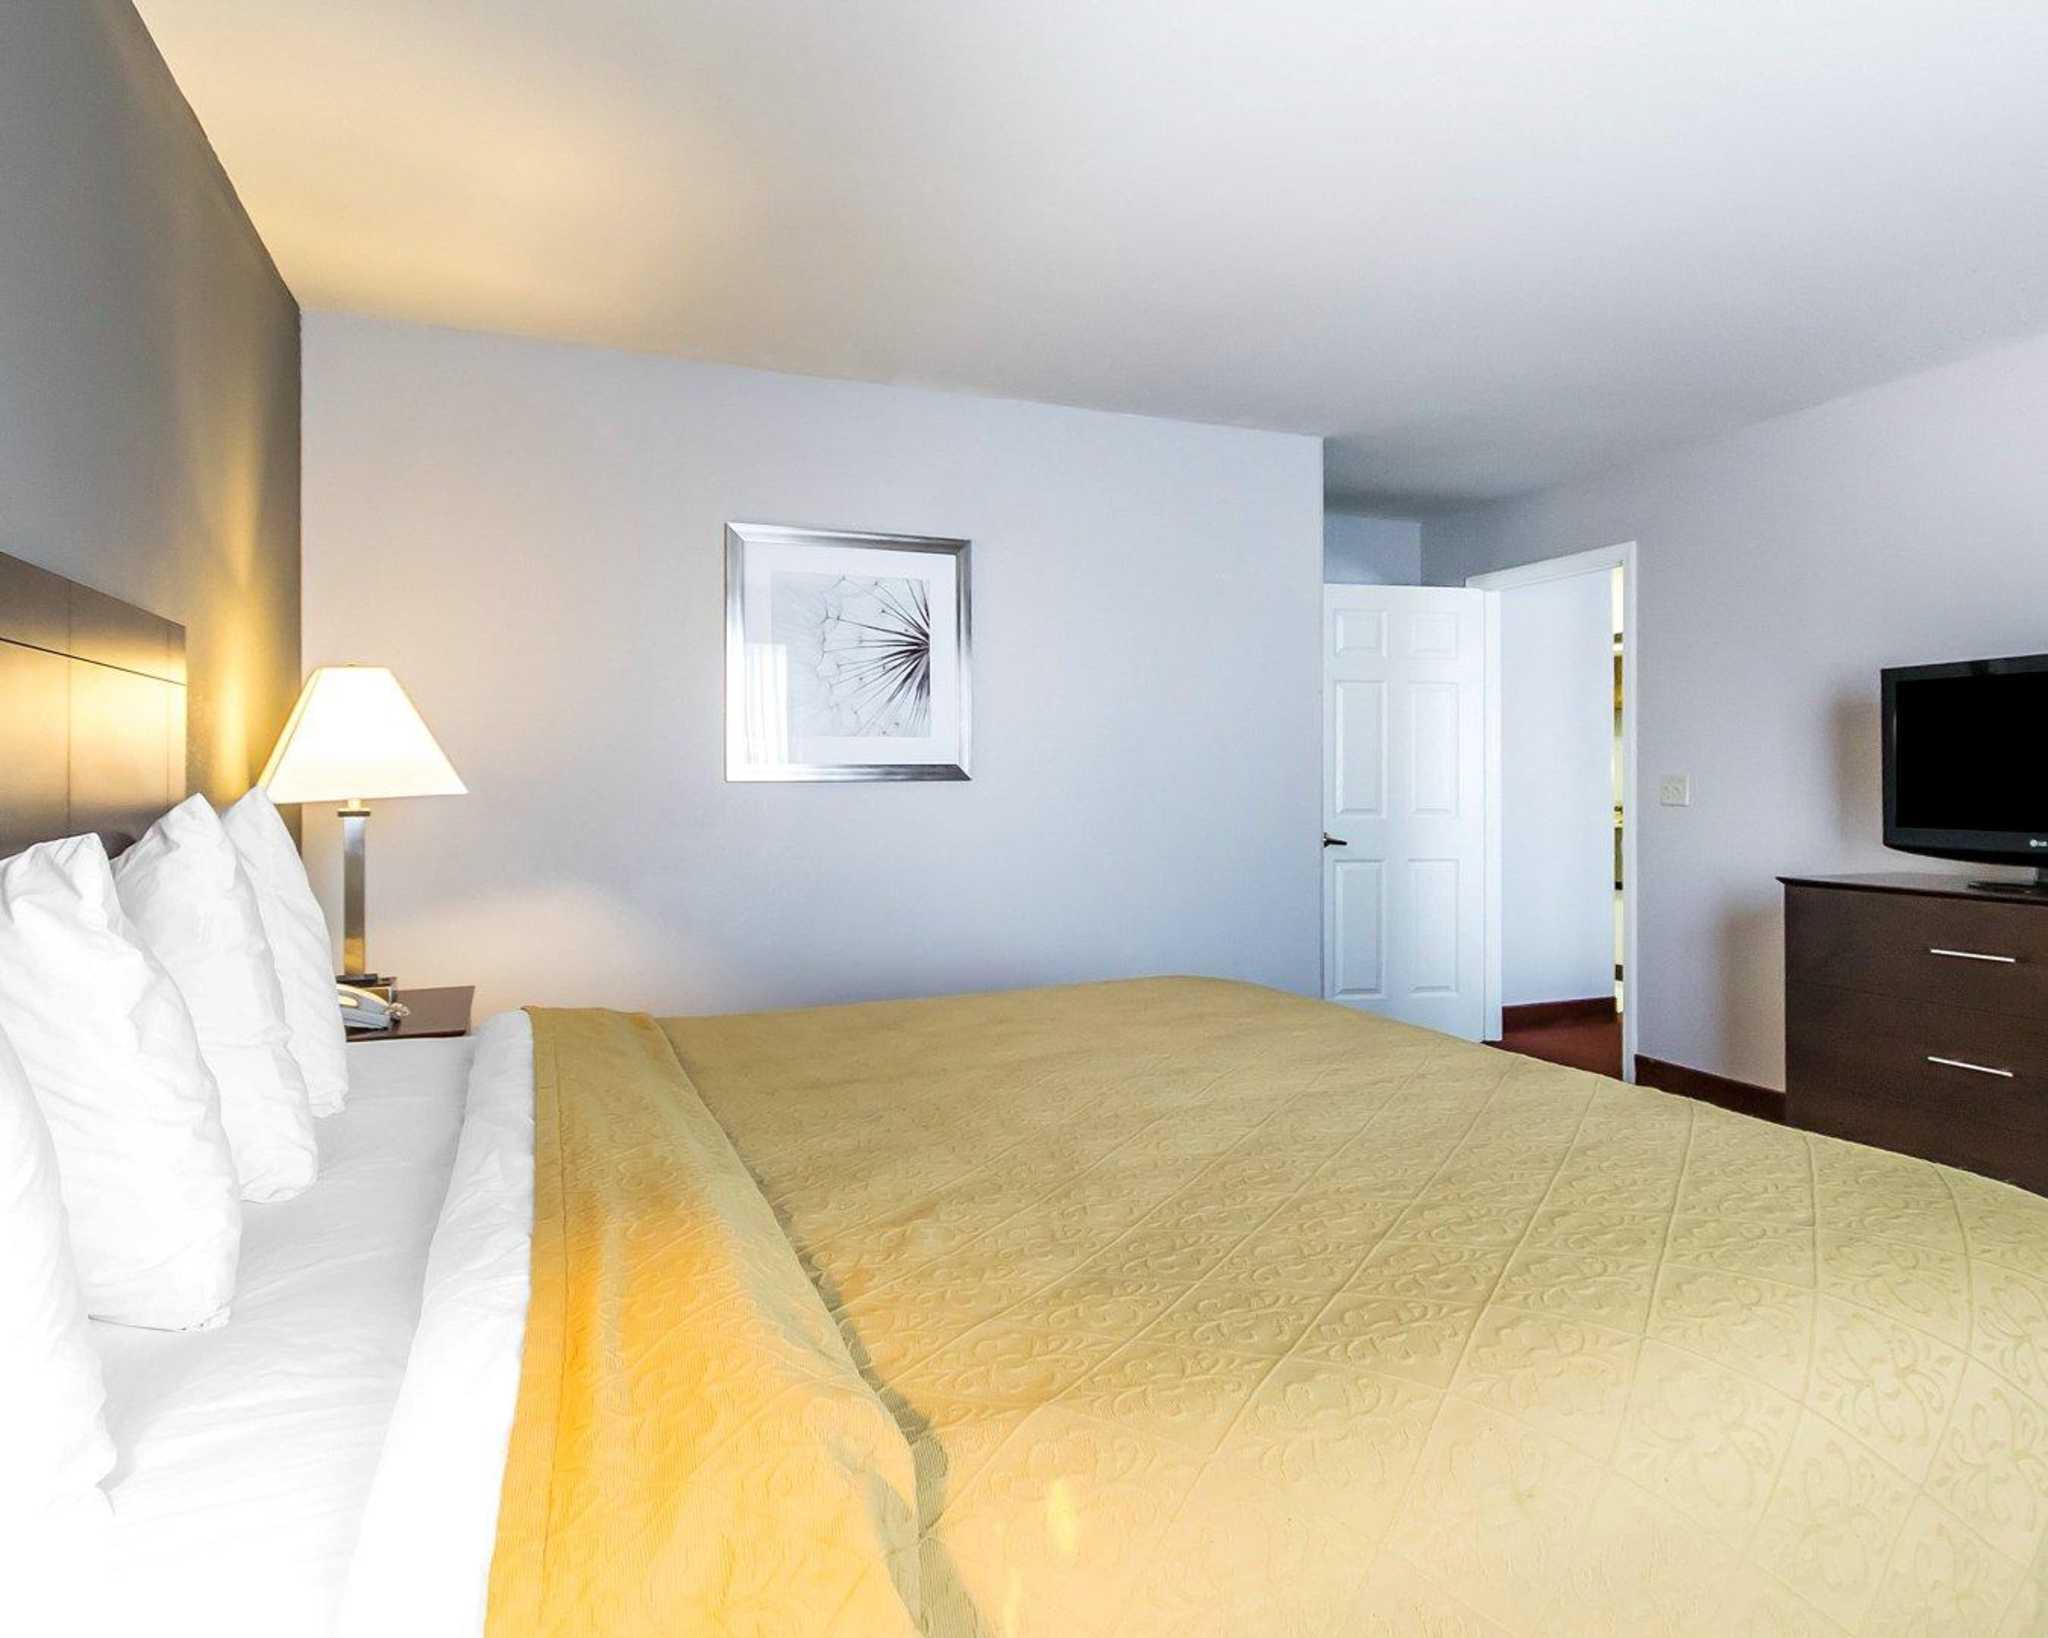 Quality Inn & Suites University/Airport image 37